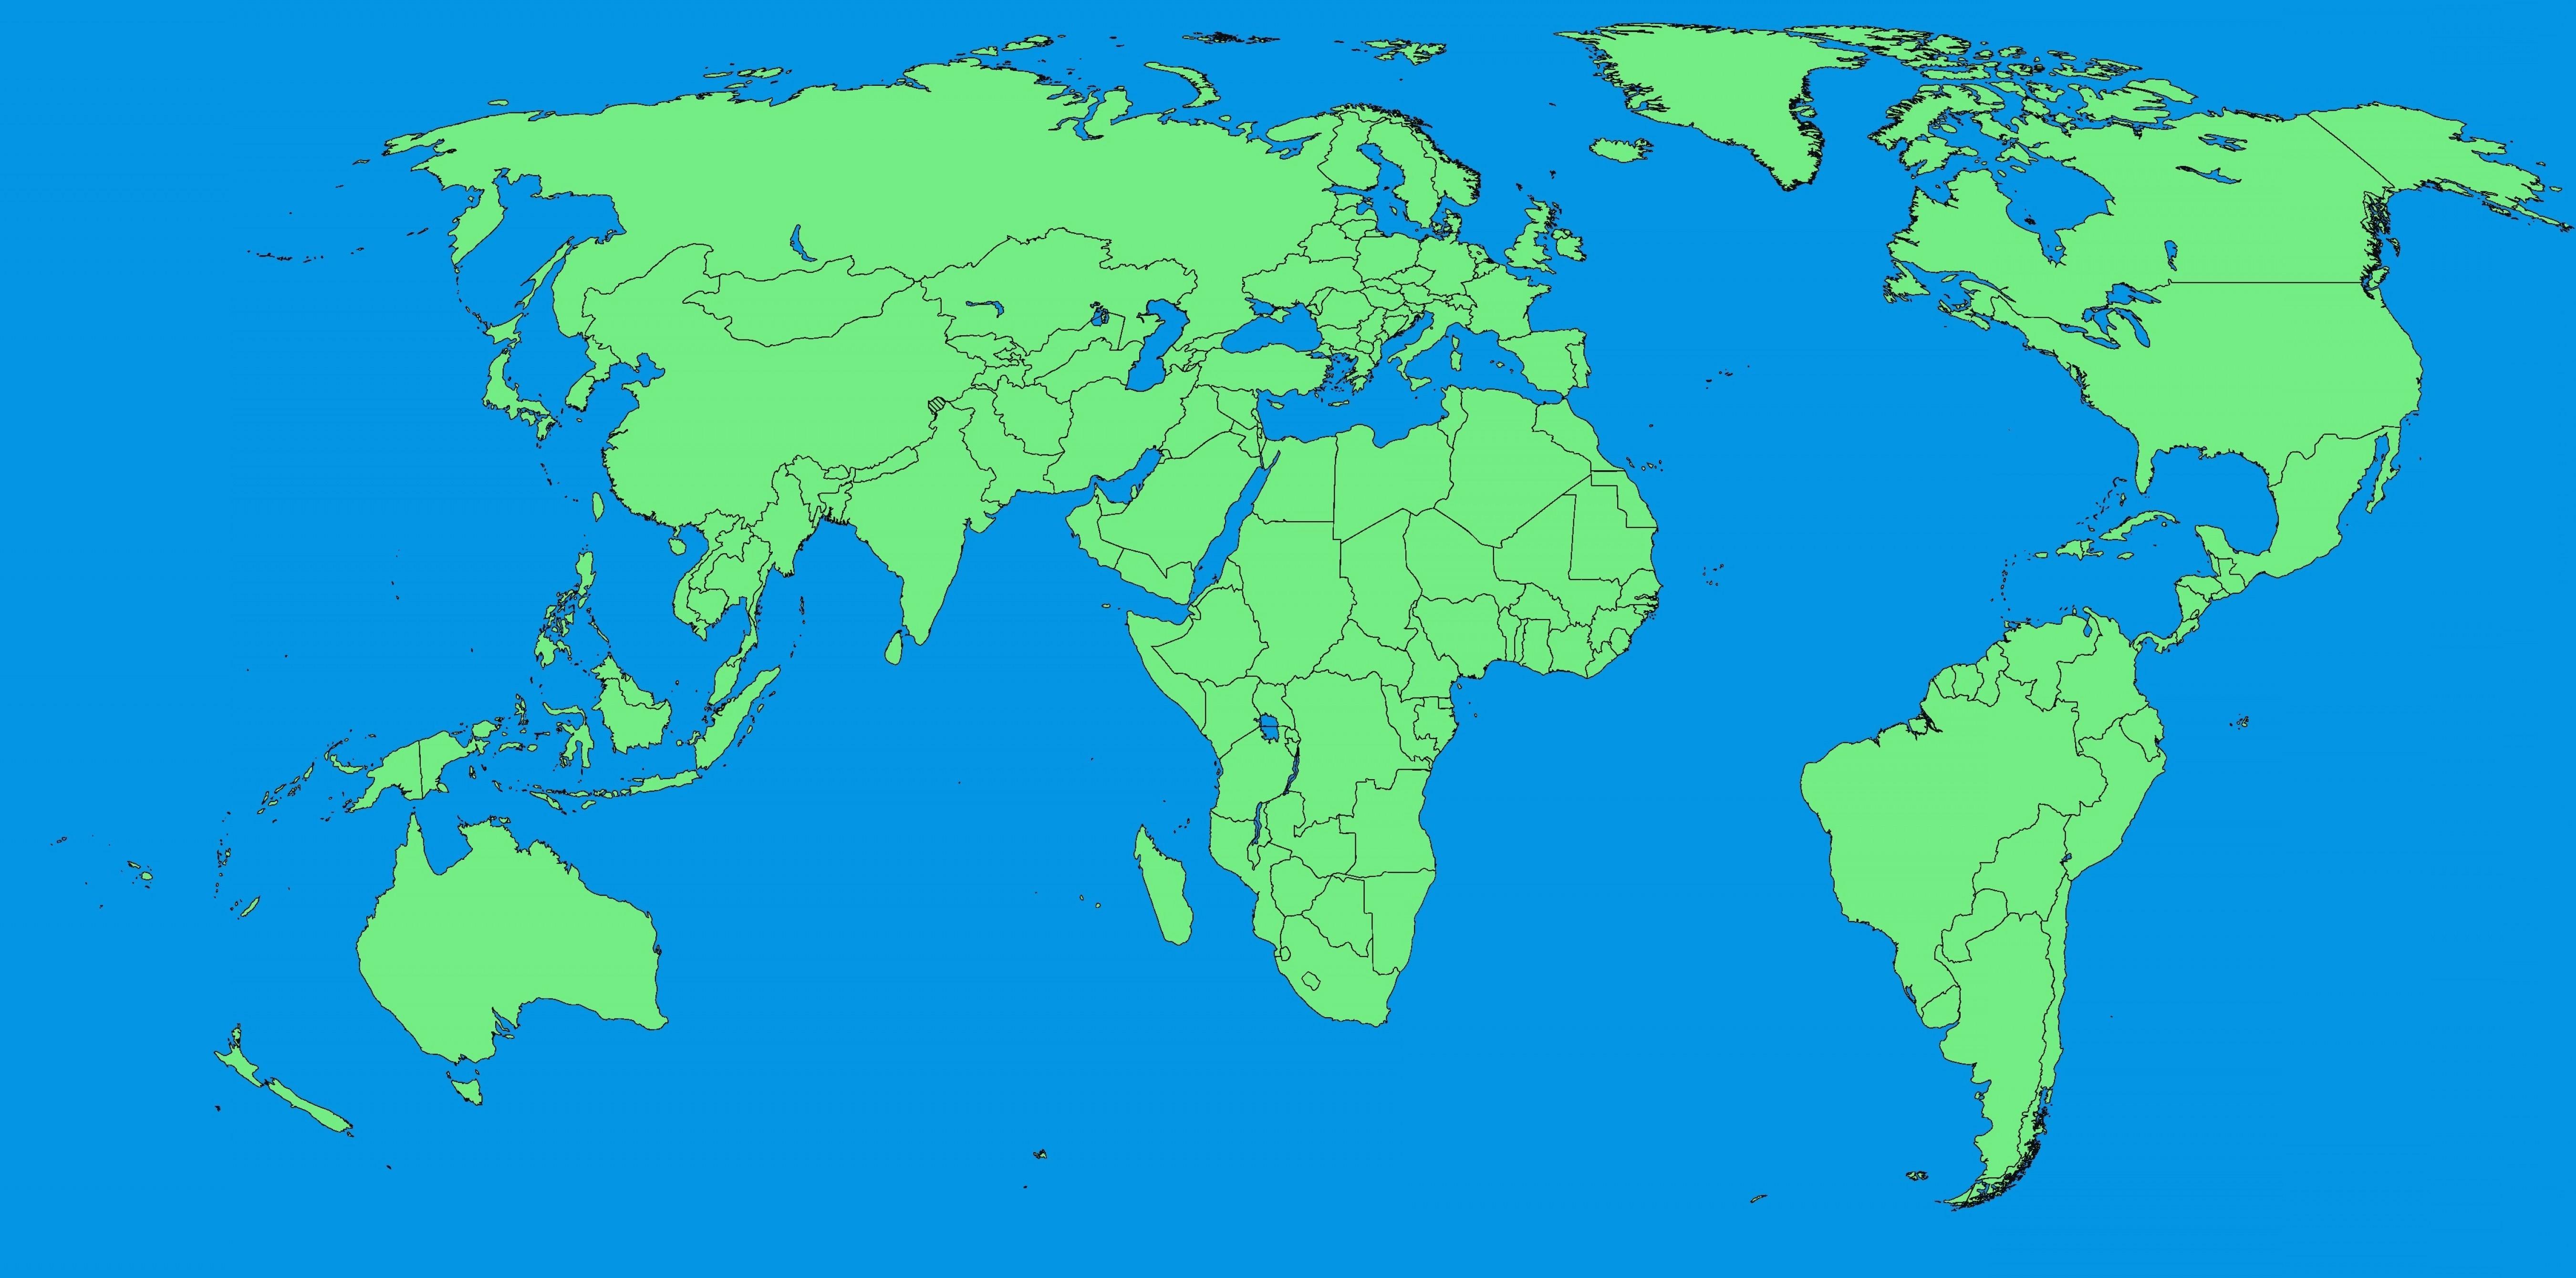 5400x2680 Simple World Map Design Copy Maps Best Simple World Map Best World